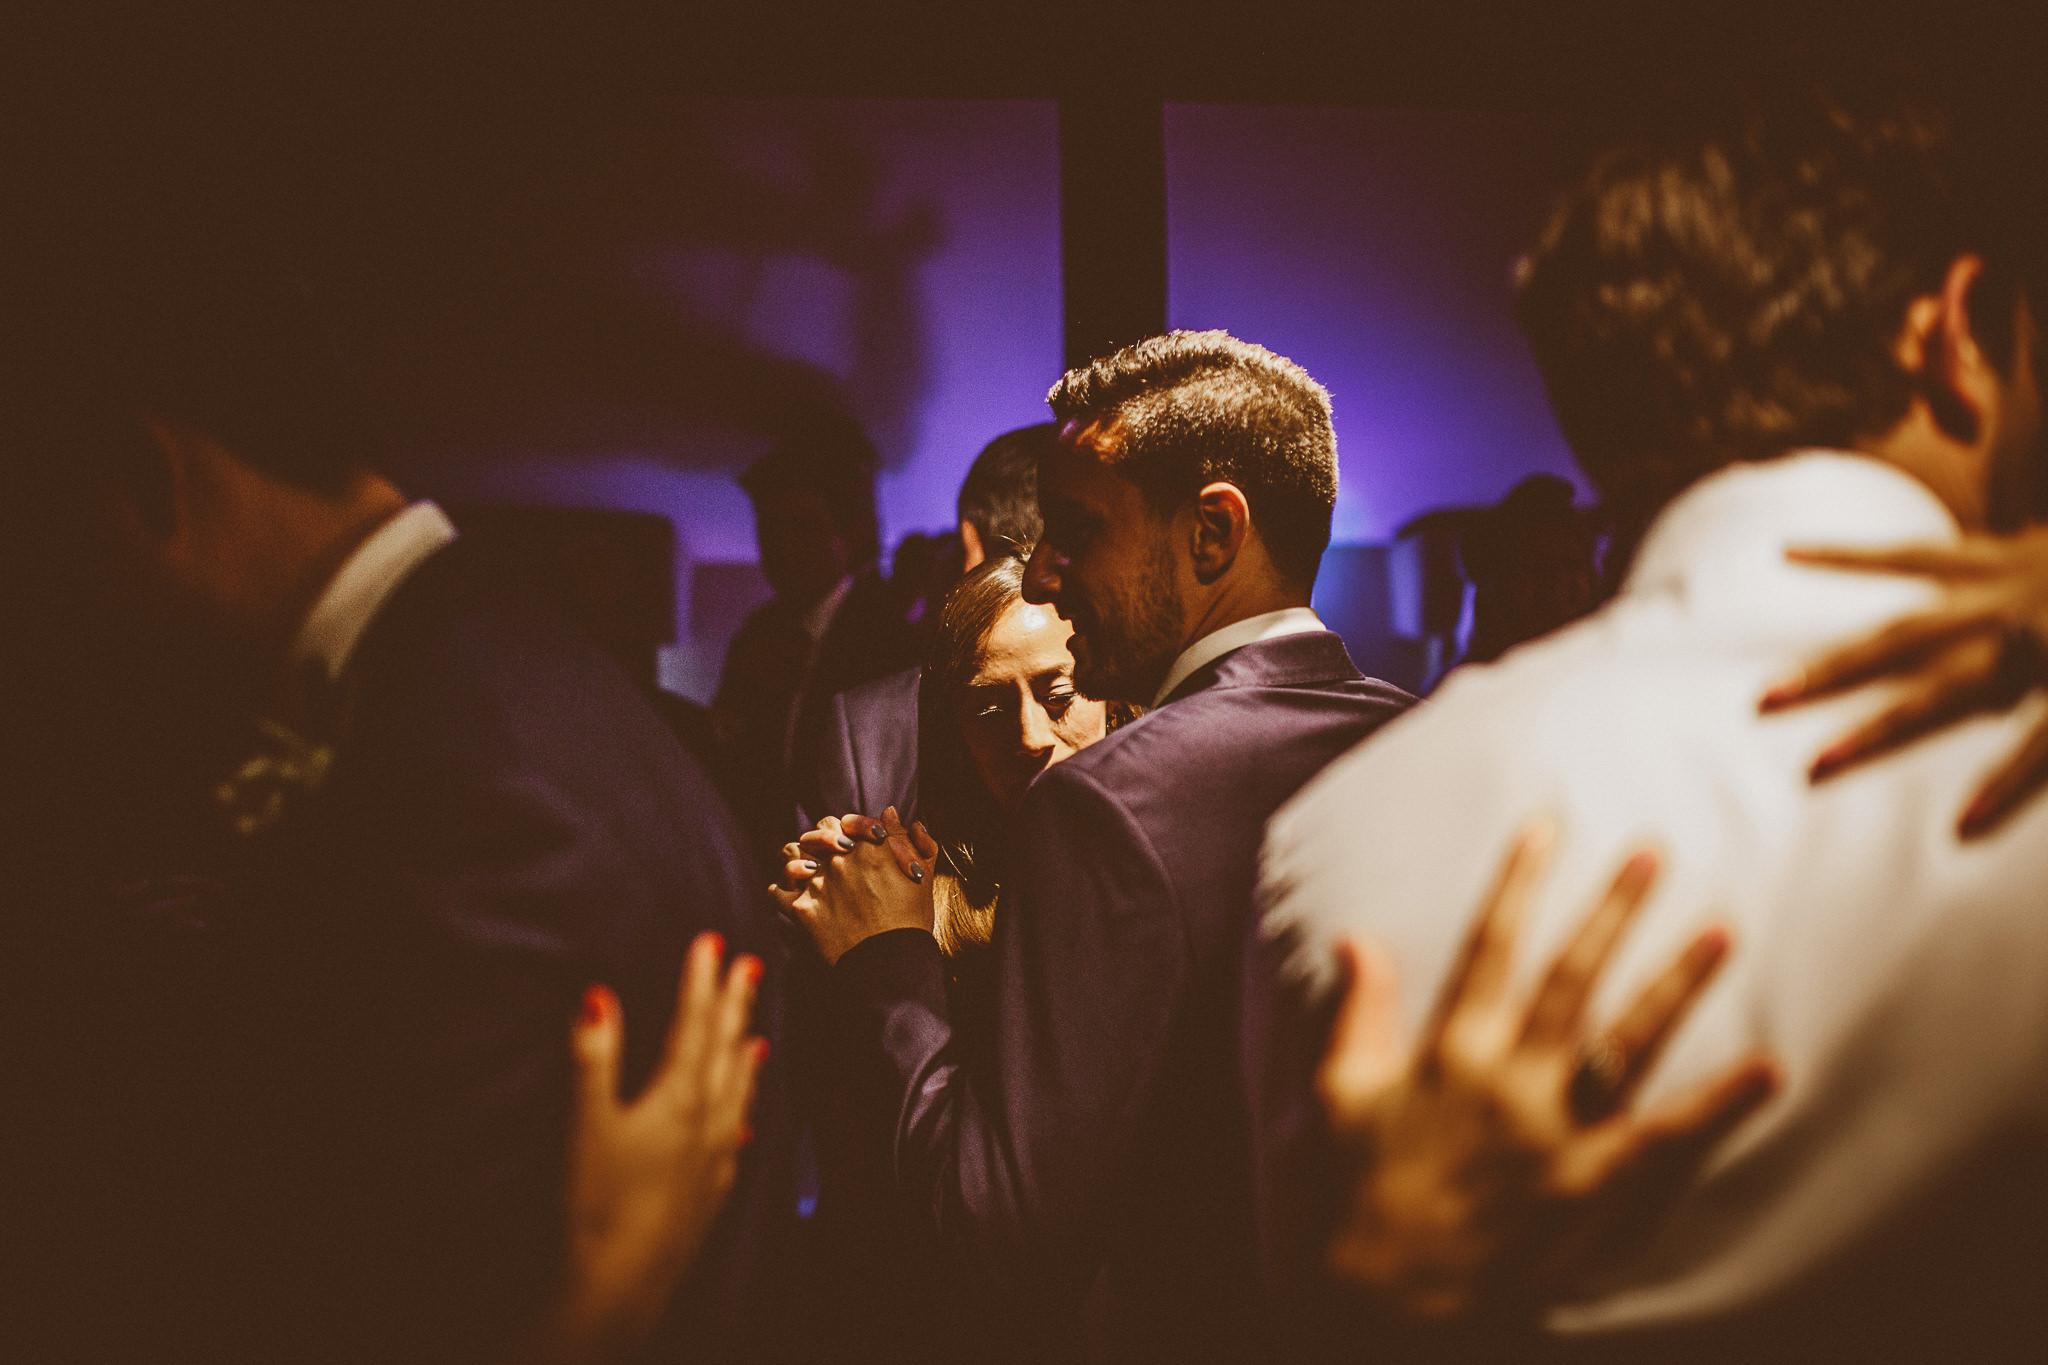 paul-marbrook-Gaynes-Park Wedding-Photographer-90147